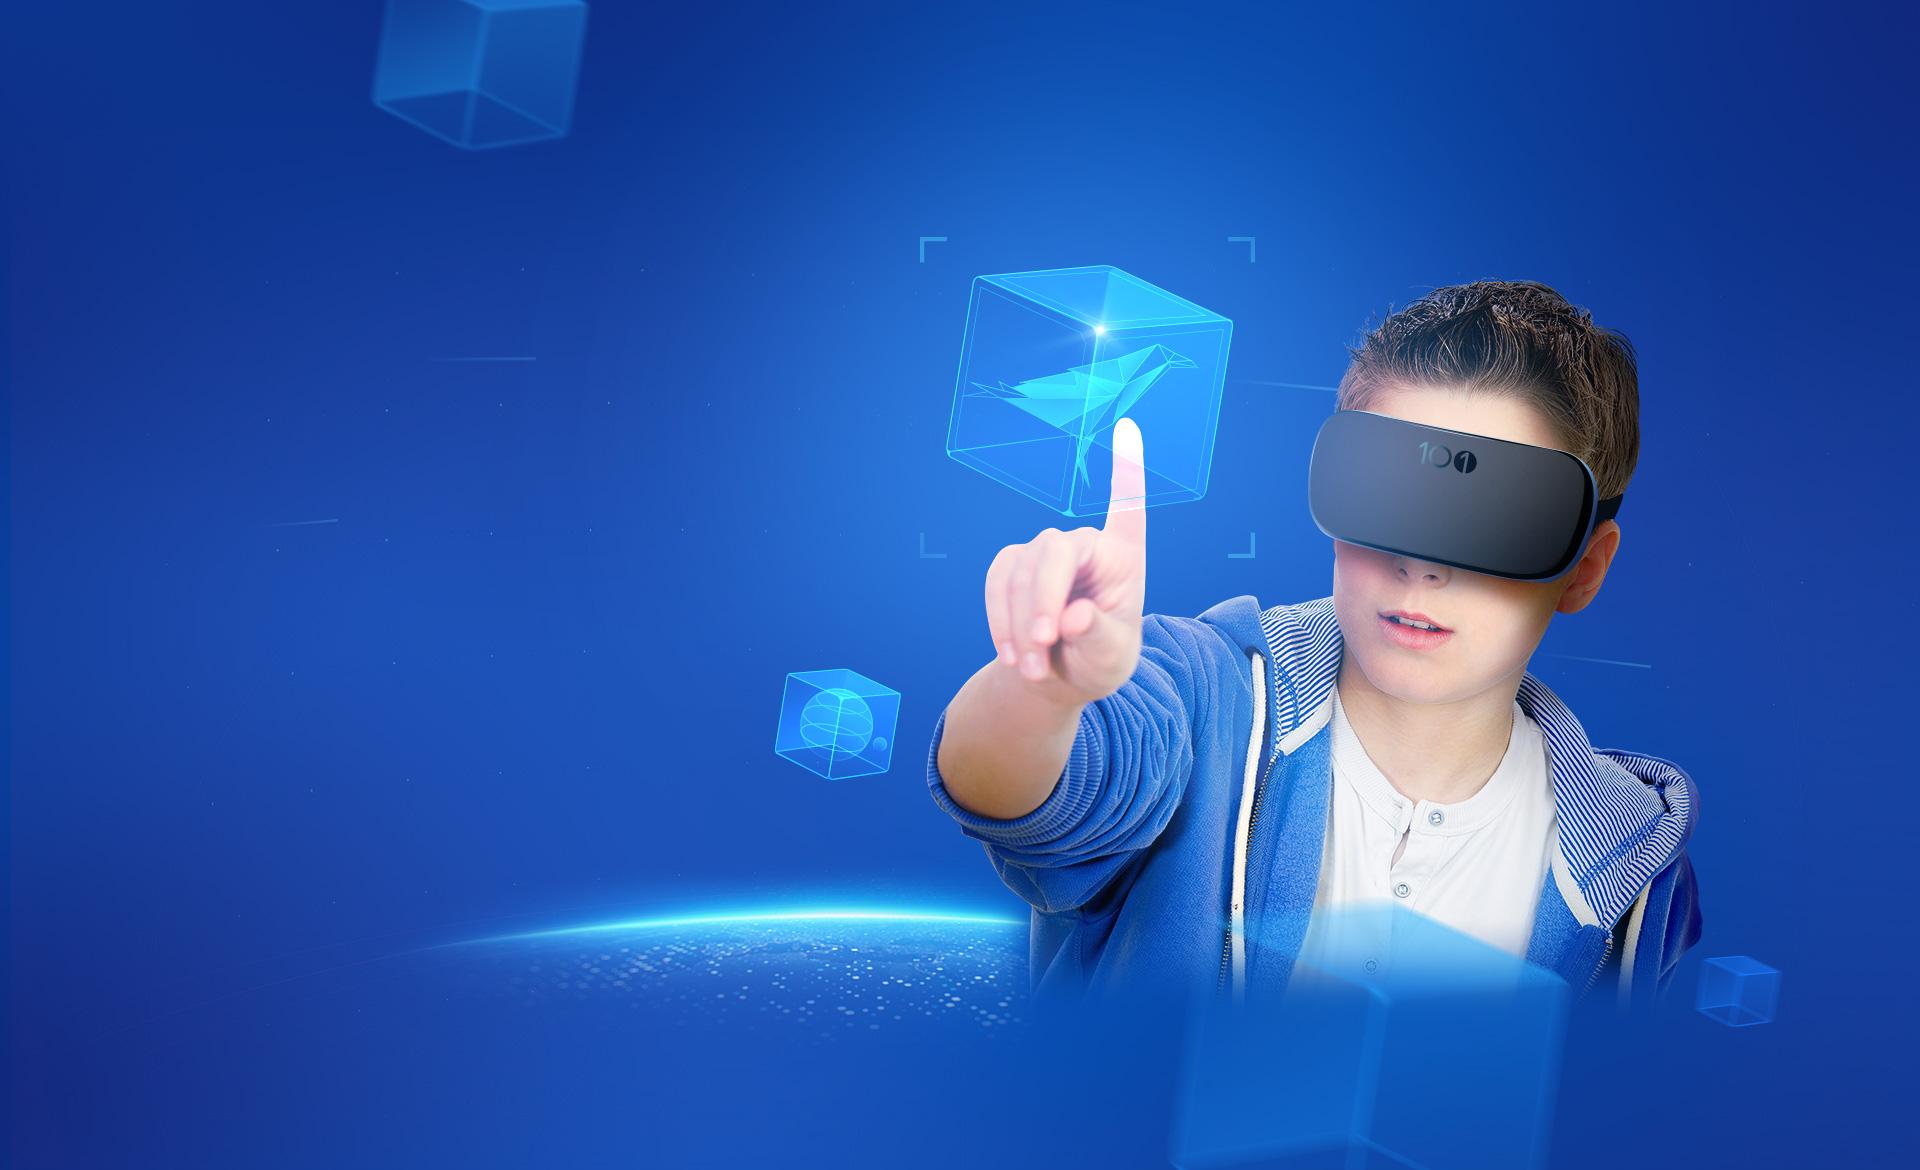 101 VR沉浸教室解决方案